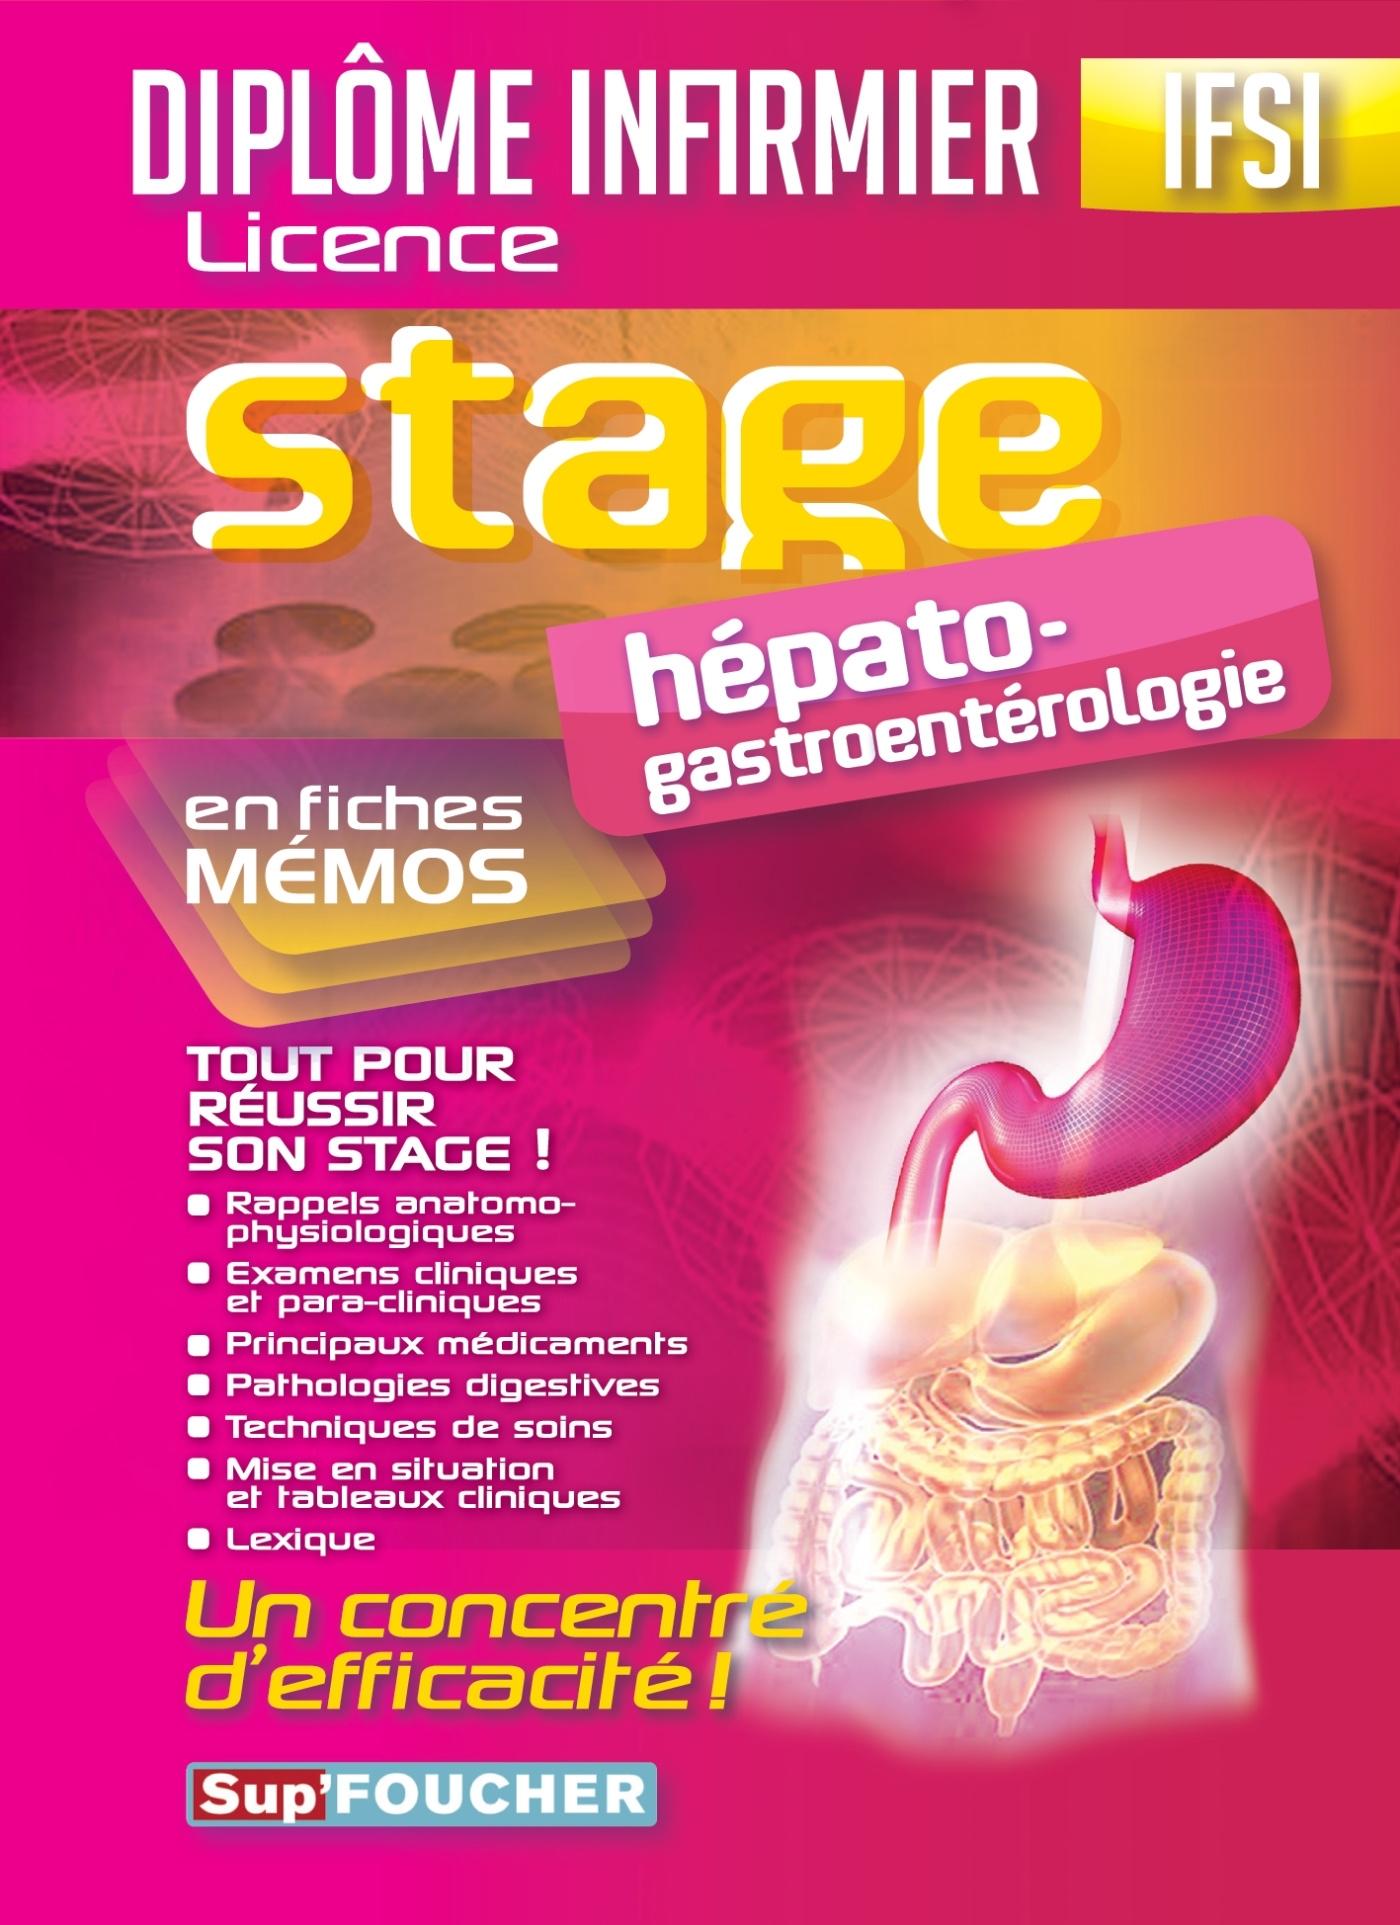 IFSI STAGE HEPATO-GASTROENTEROLOGIE - DIPLOME INFIRMIER